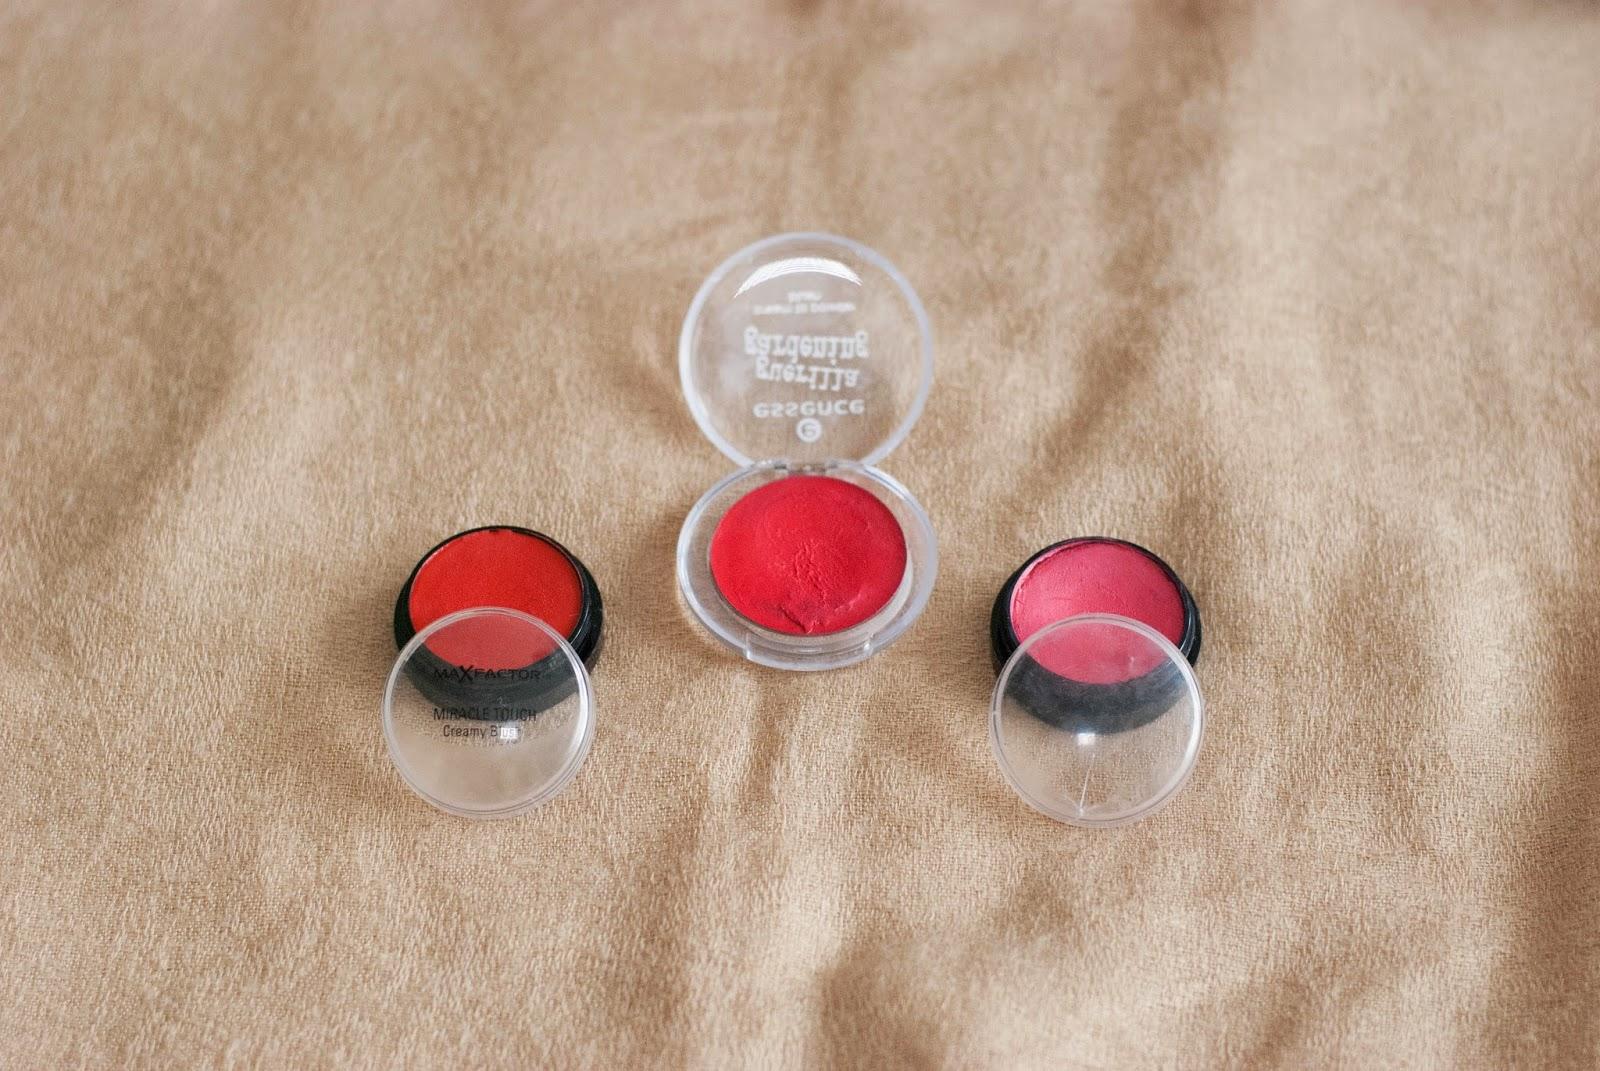 Blush Collection - The creams